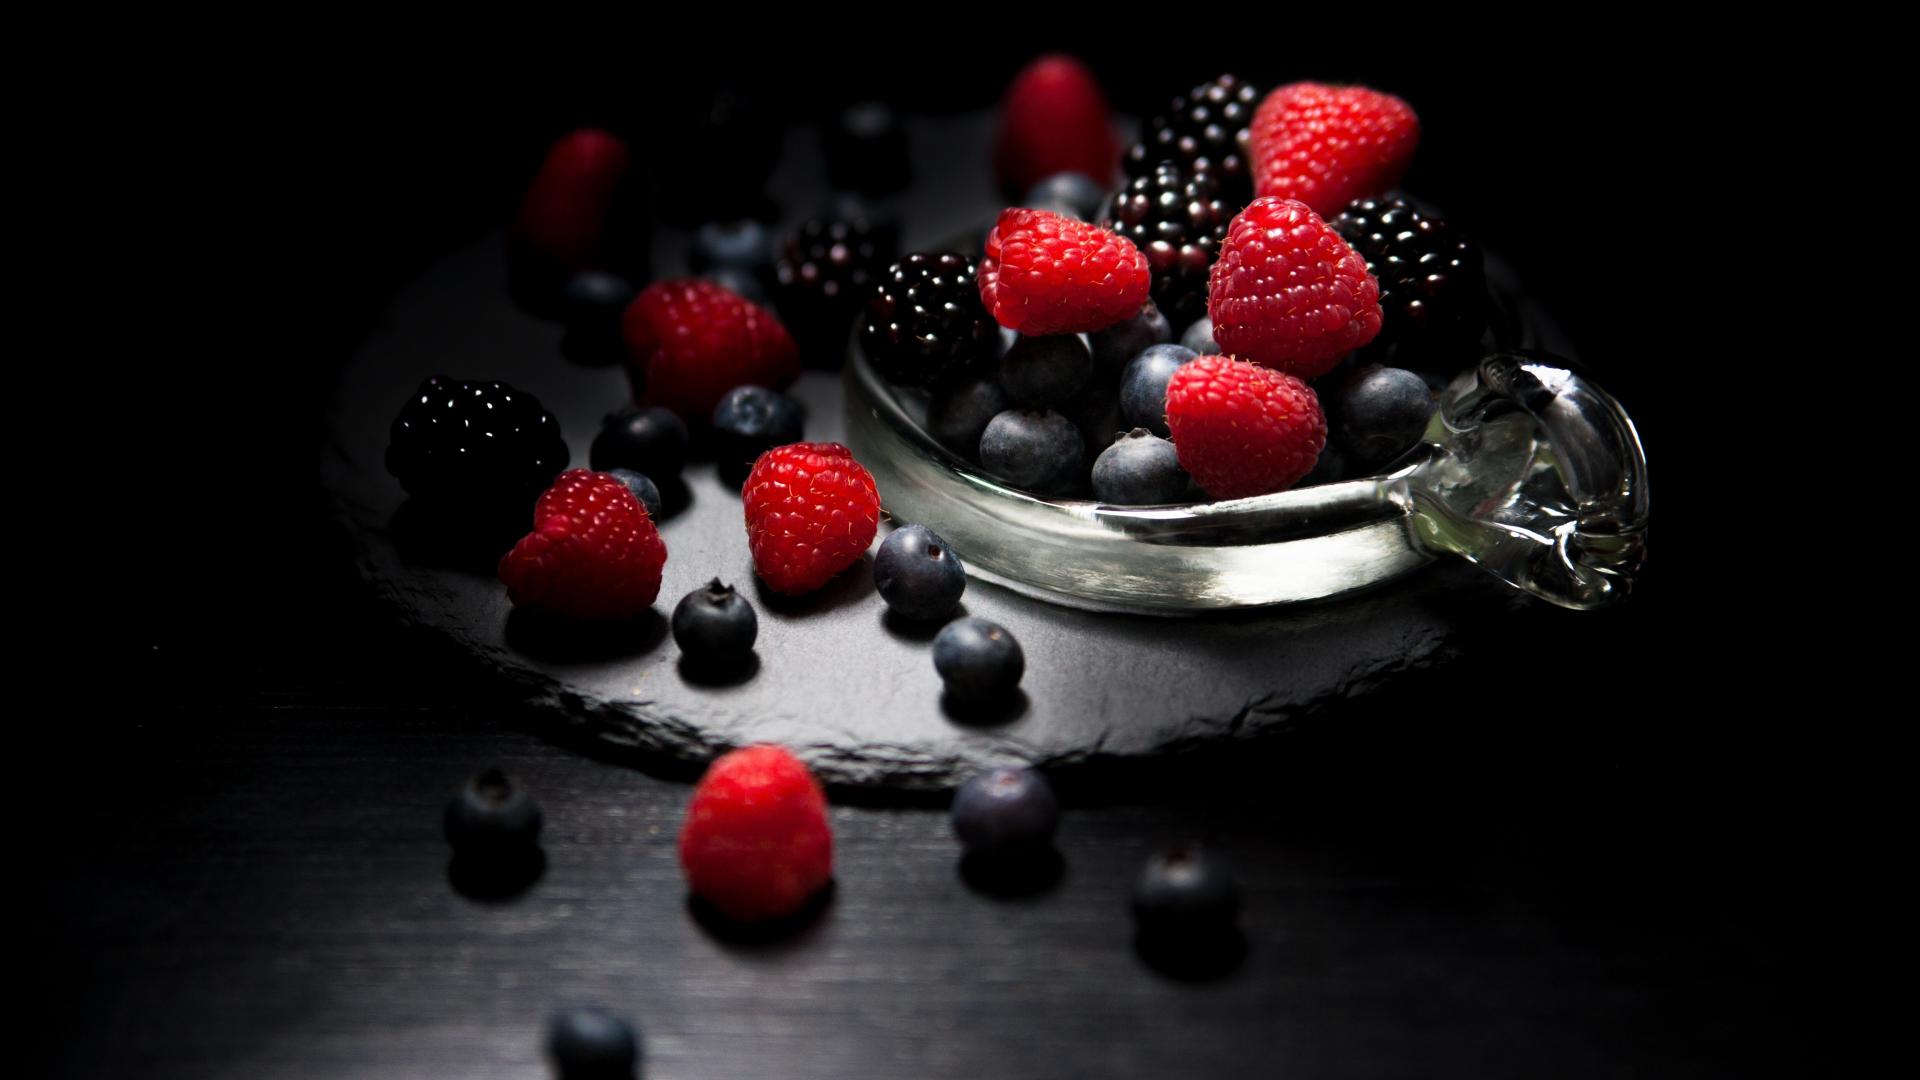 Dark mood, food, fruits, Raspberry, blueberry, Blackberry, 1920x1080 wallpaper